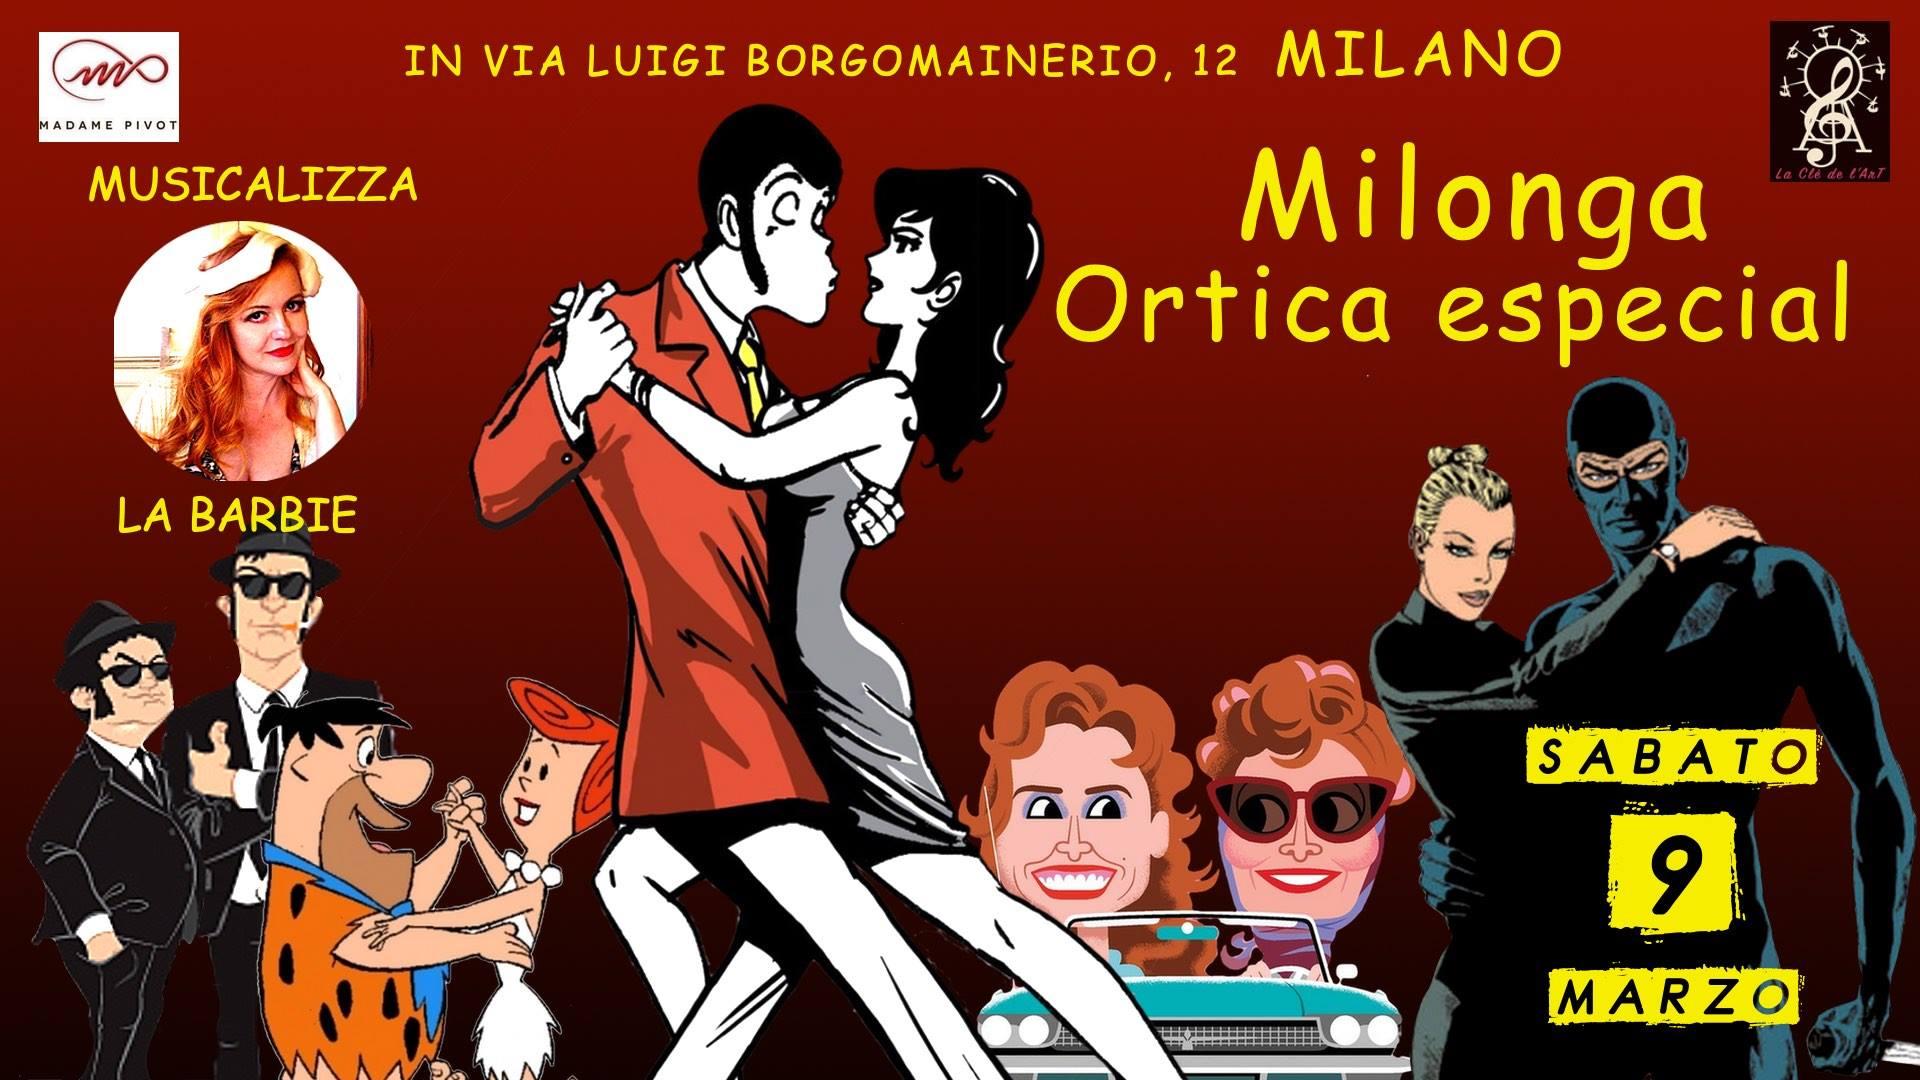 FaitangoFederazione Tango Italiane Argentino Associazioni 5cRjq34ALS